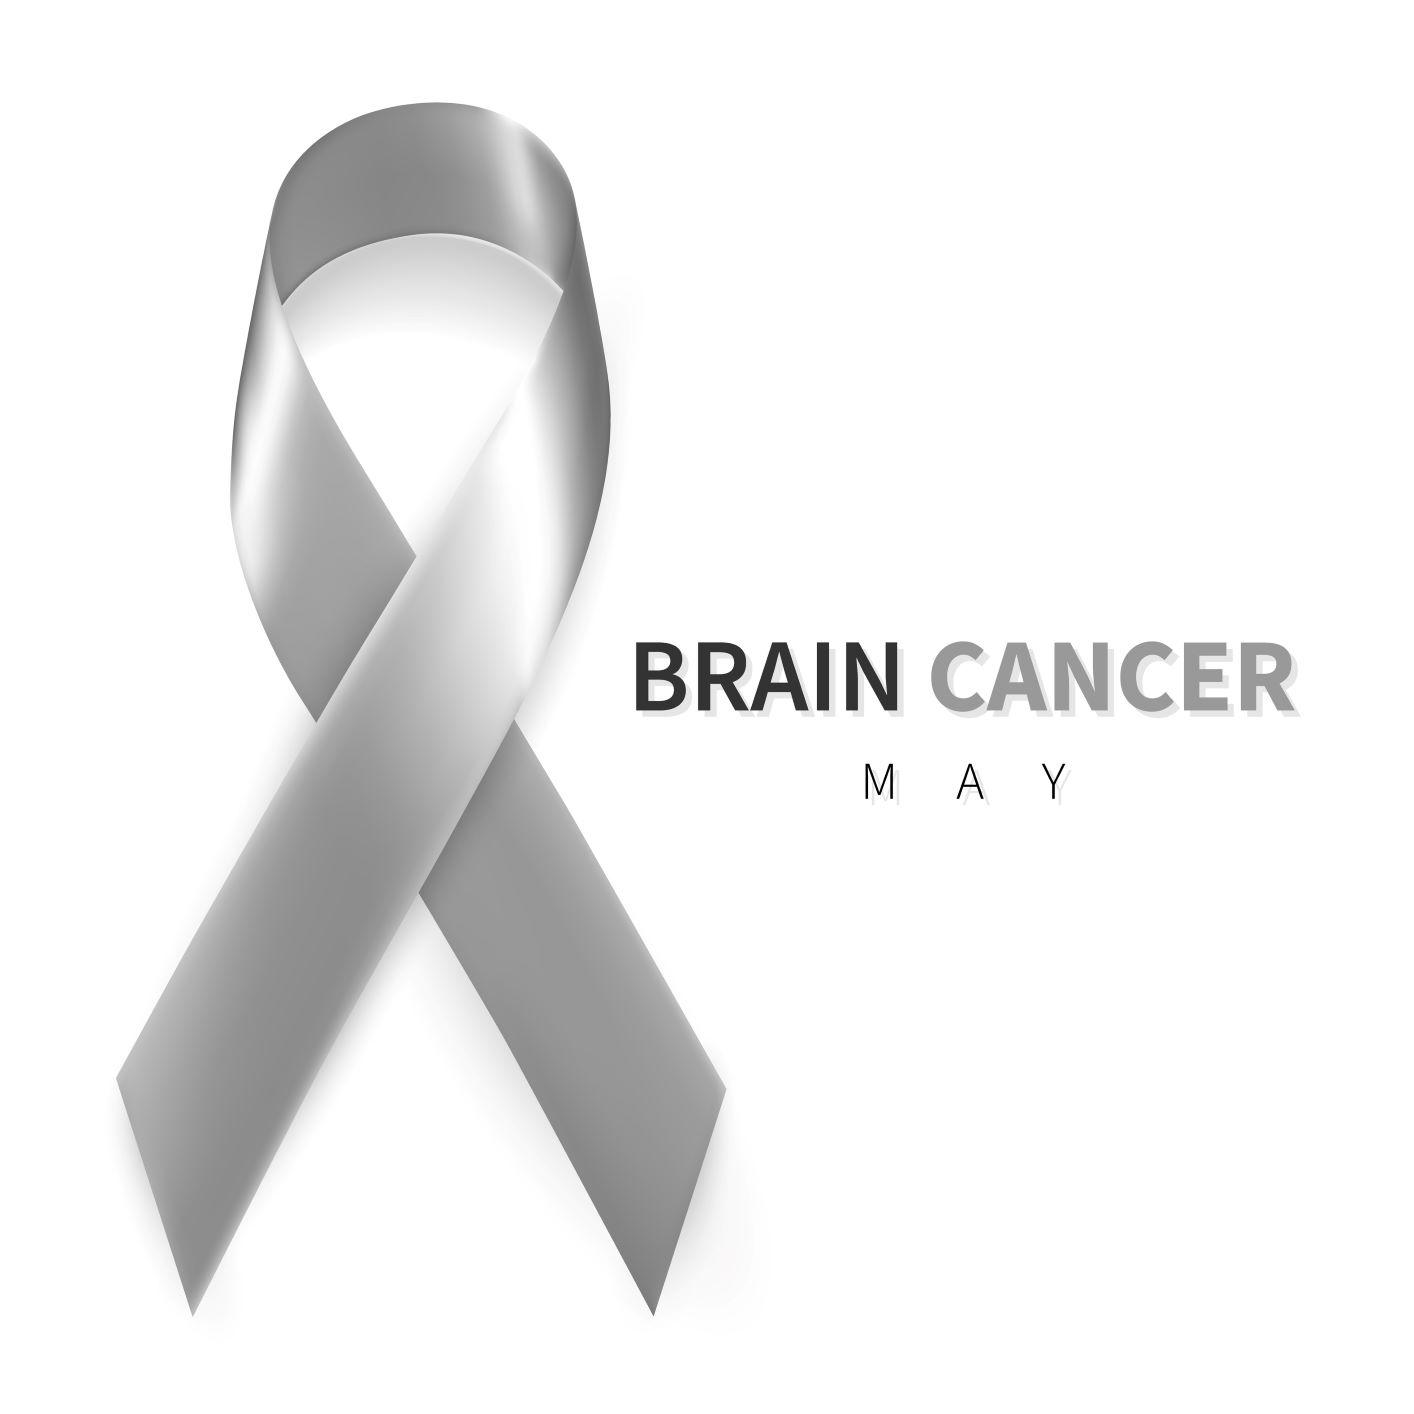 It's Brain Tumor Awareness Month!